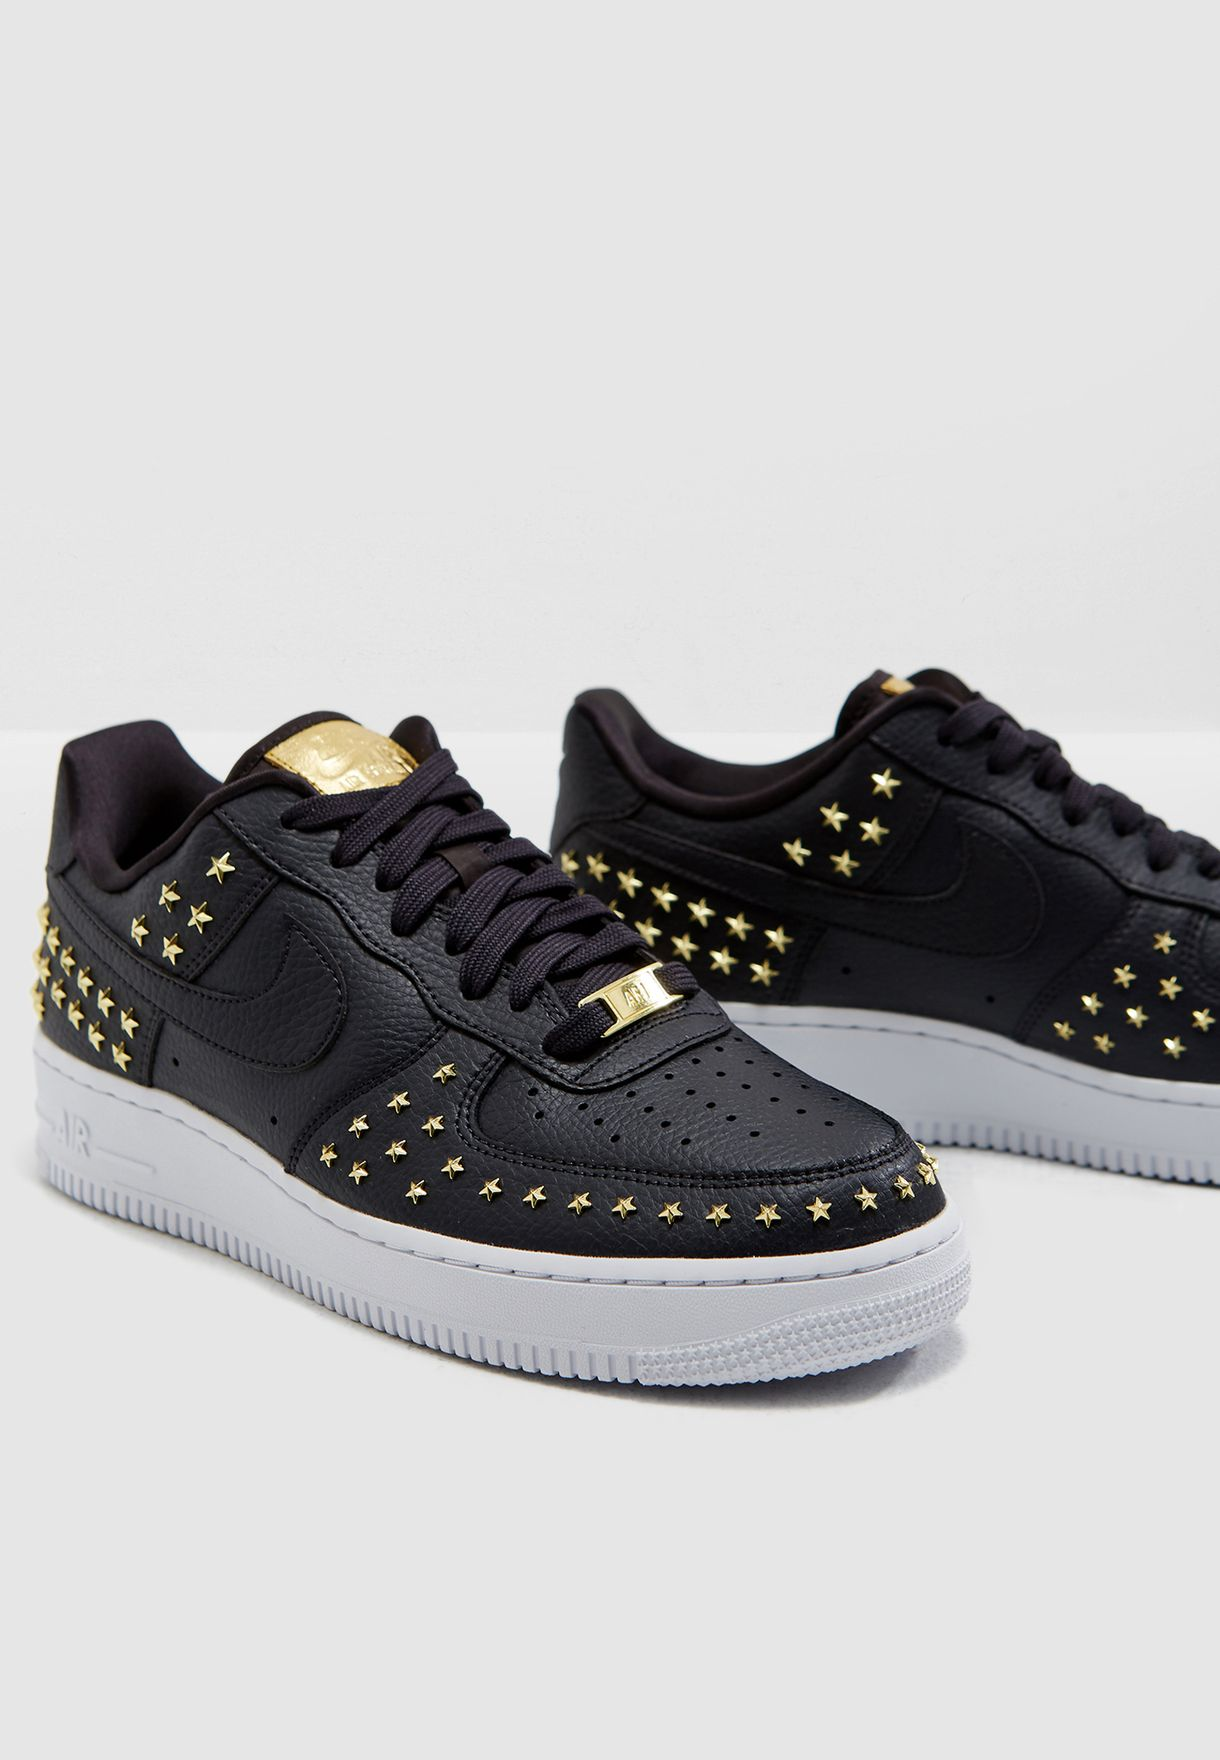 651a8a92e5b39 Shop Nike black Air Force 1 '07 XX AR0639-001 for Women in UAE ...